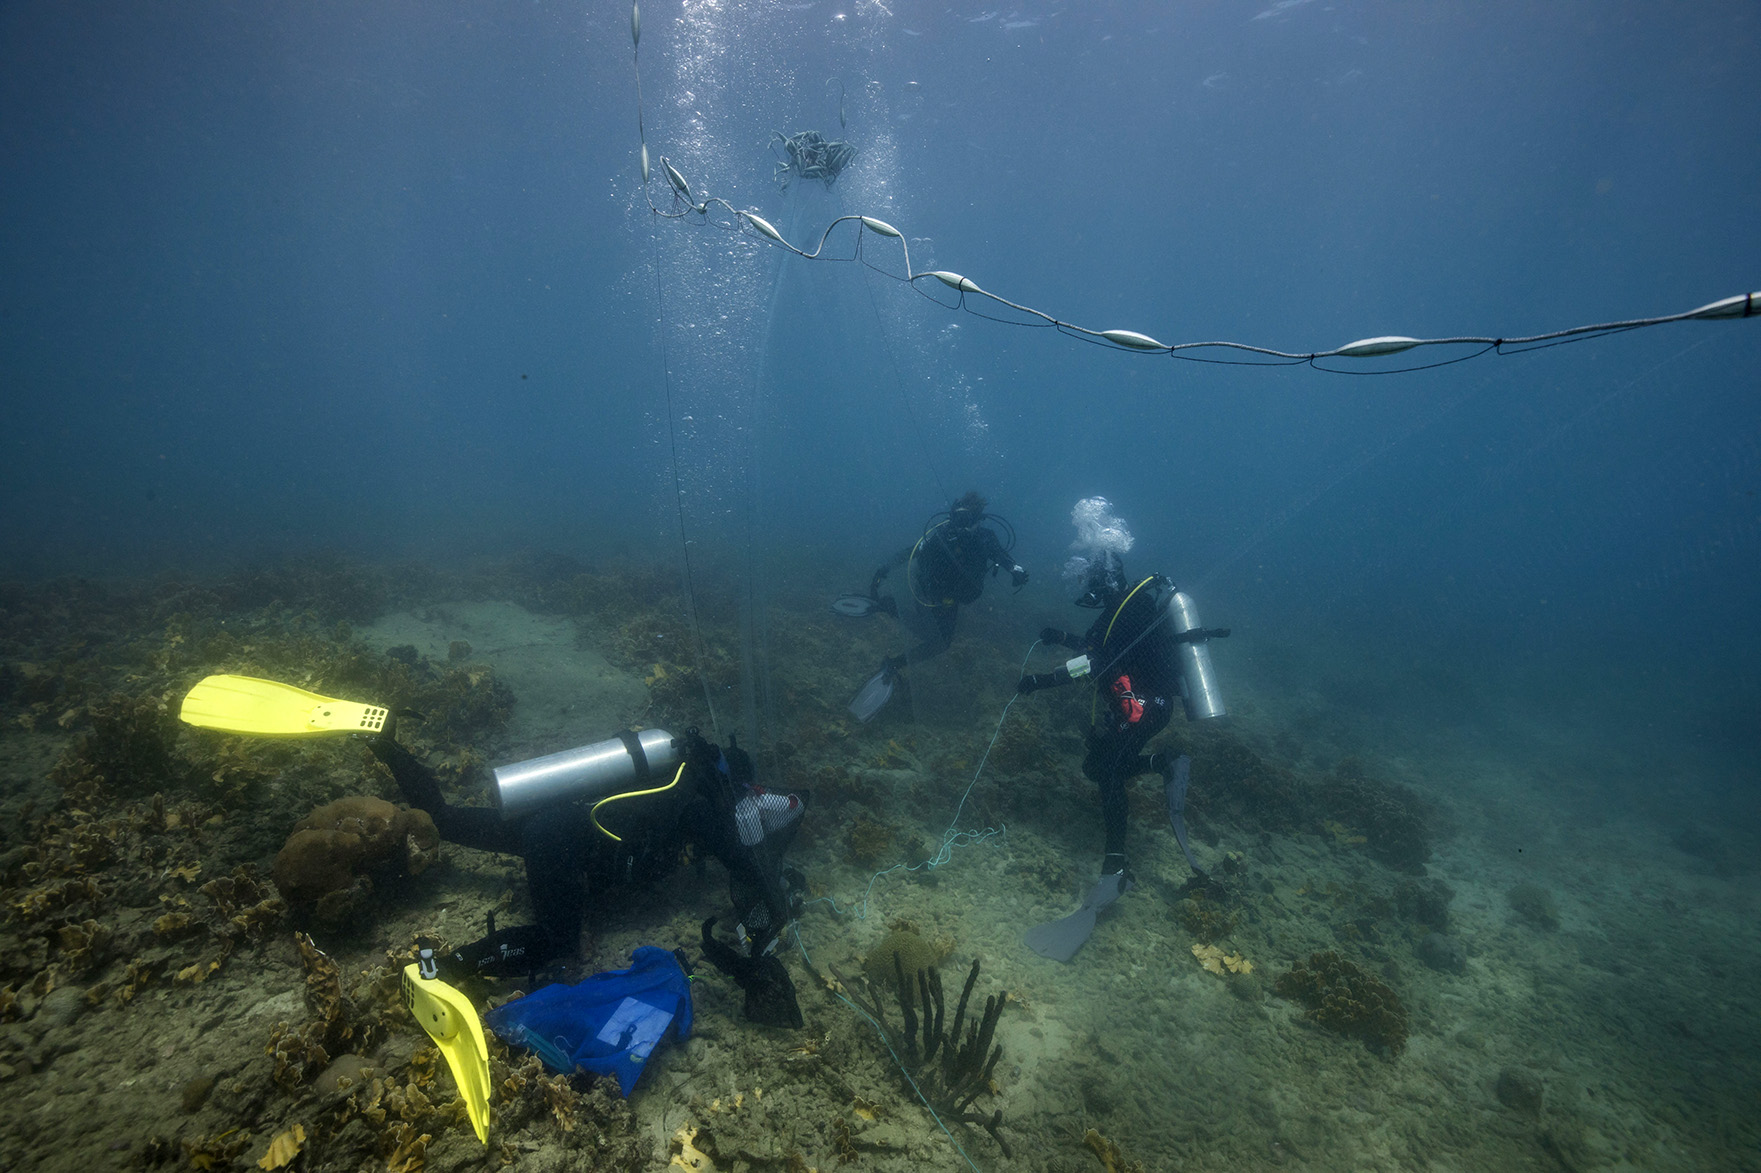 Déploiement et installation du grand filet de fond (2). Santa Marta, Octobre 2018 © Olivier Borde. Explorations de Monaco.